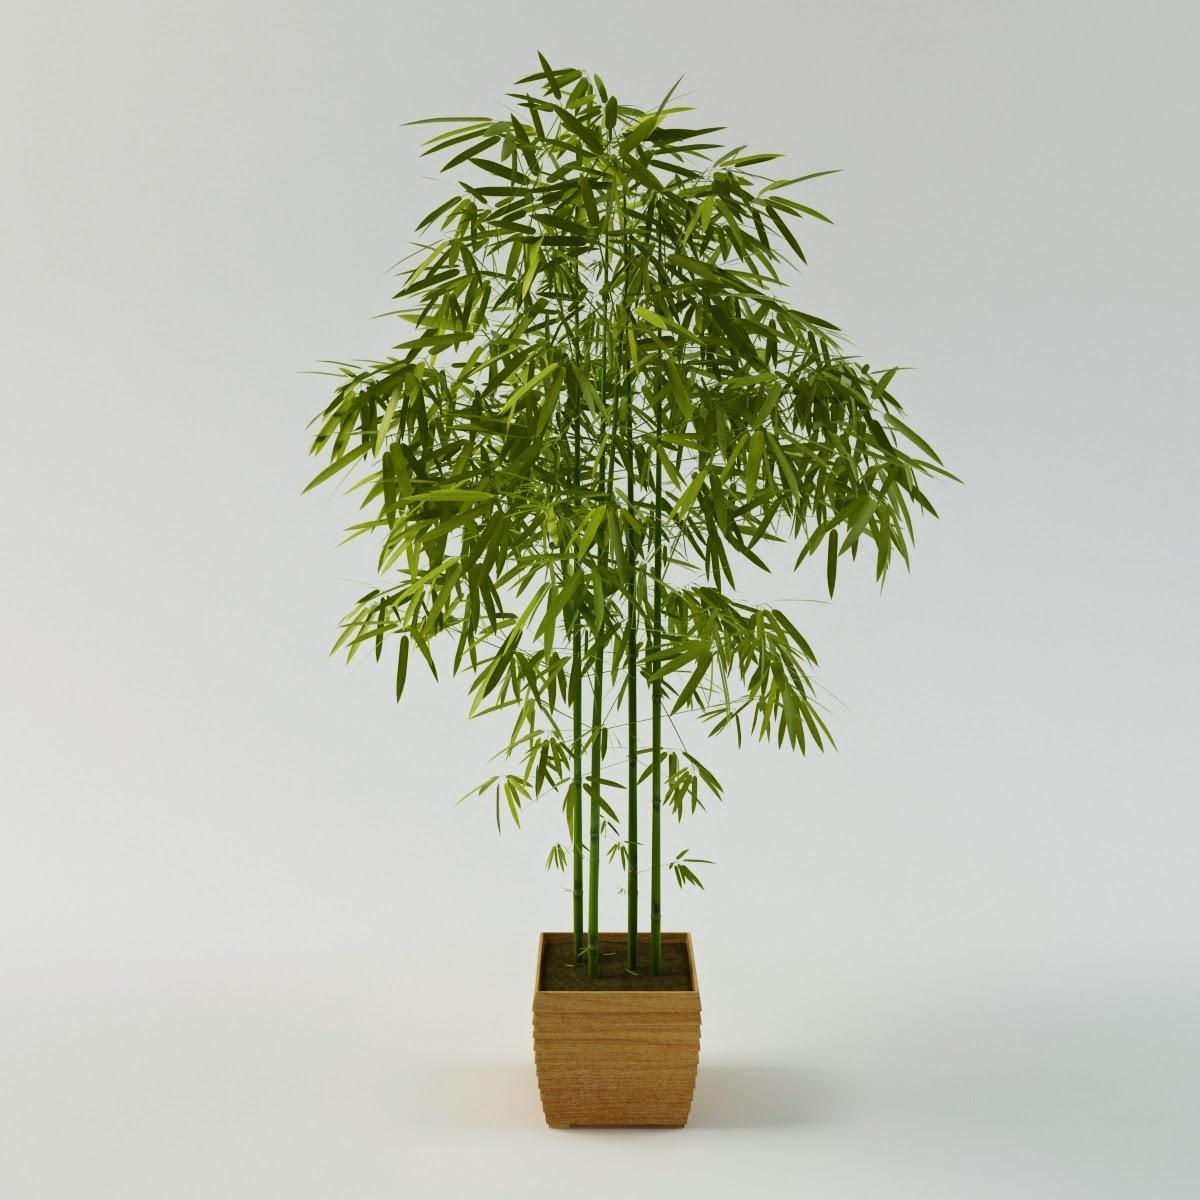 3d models for professionals: Bamboo palm 3d model